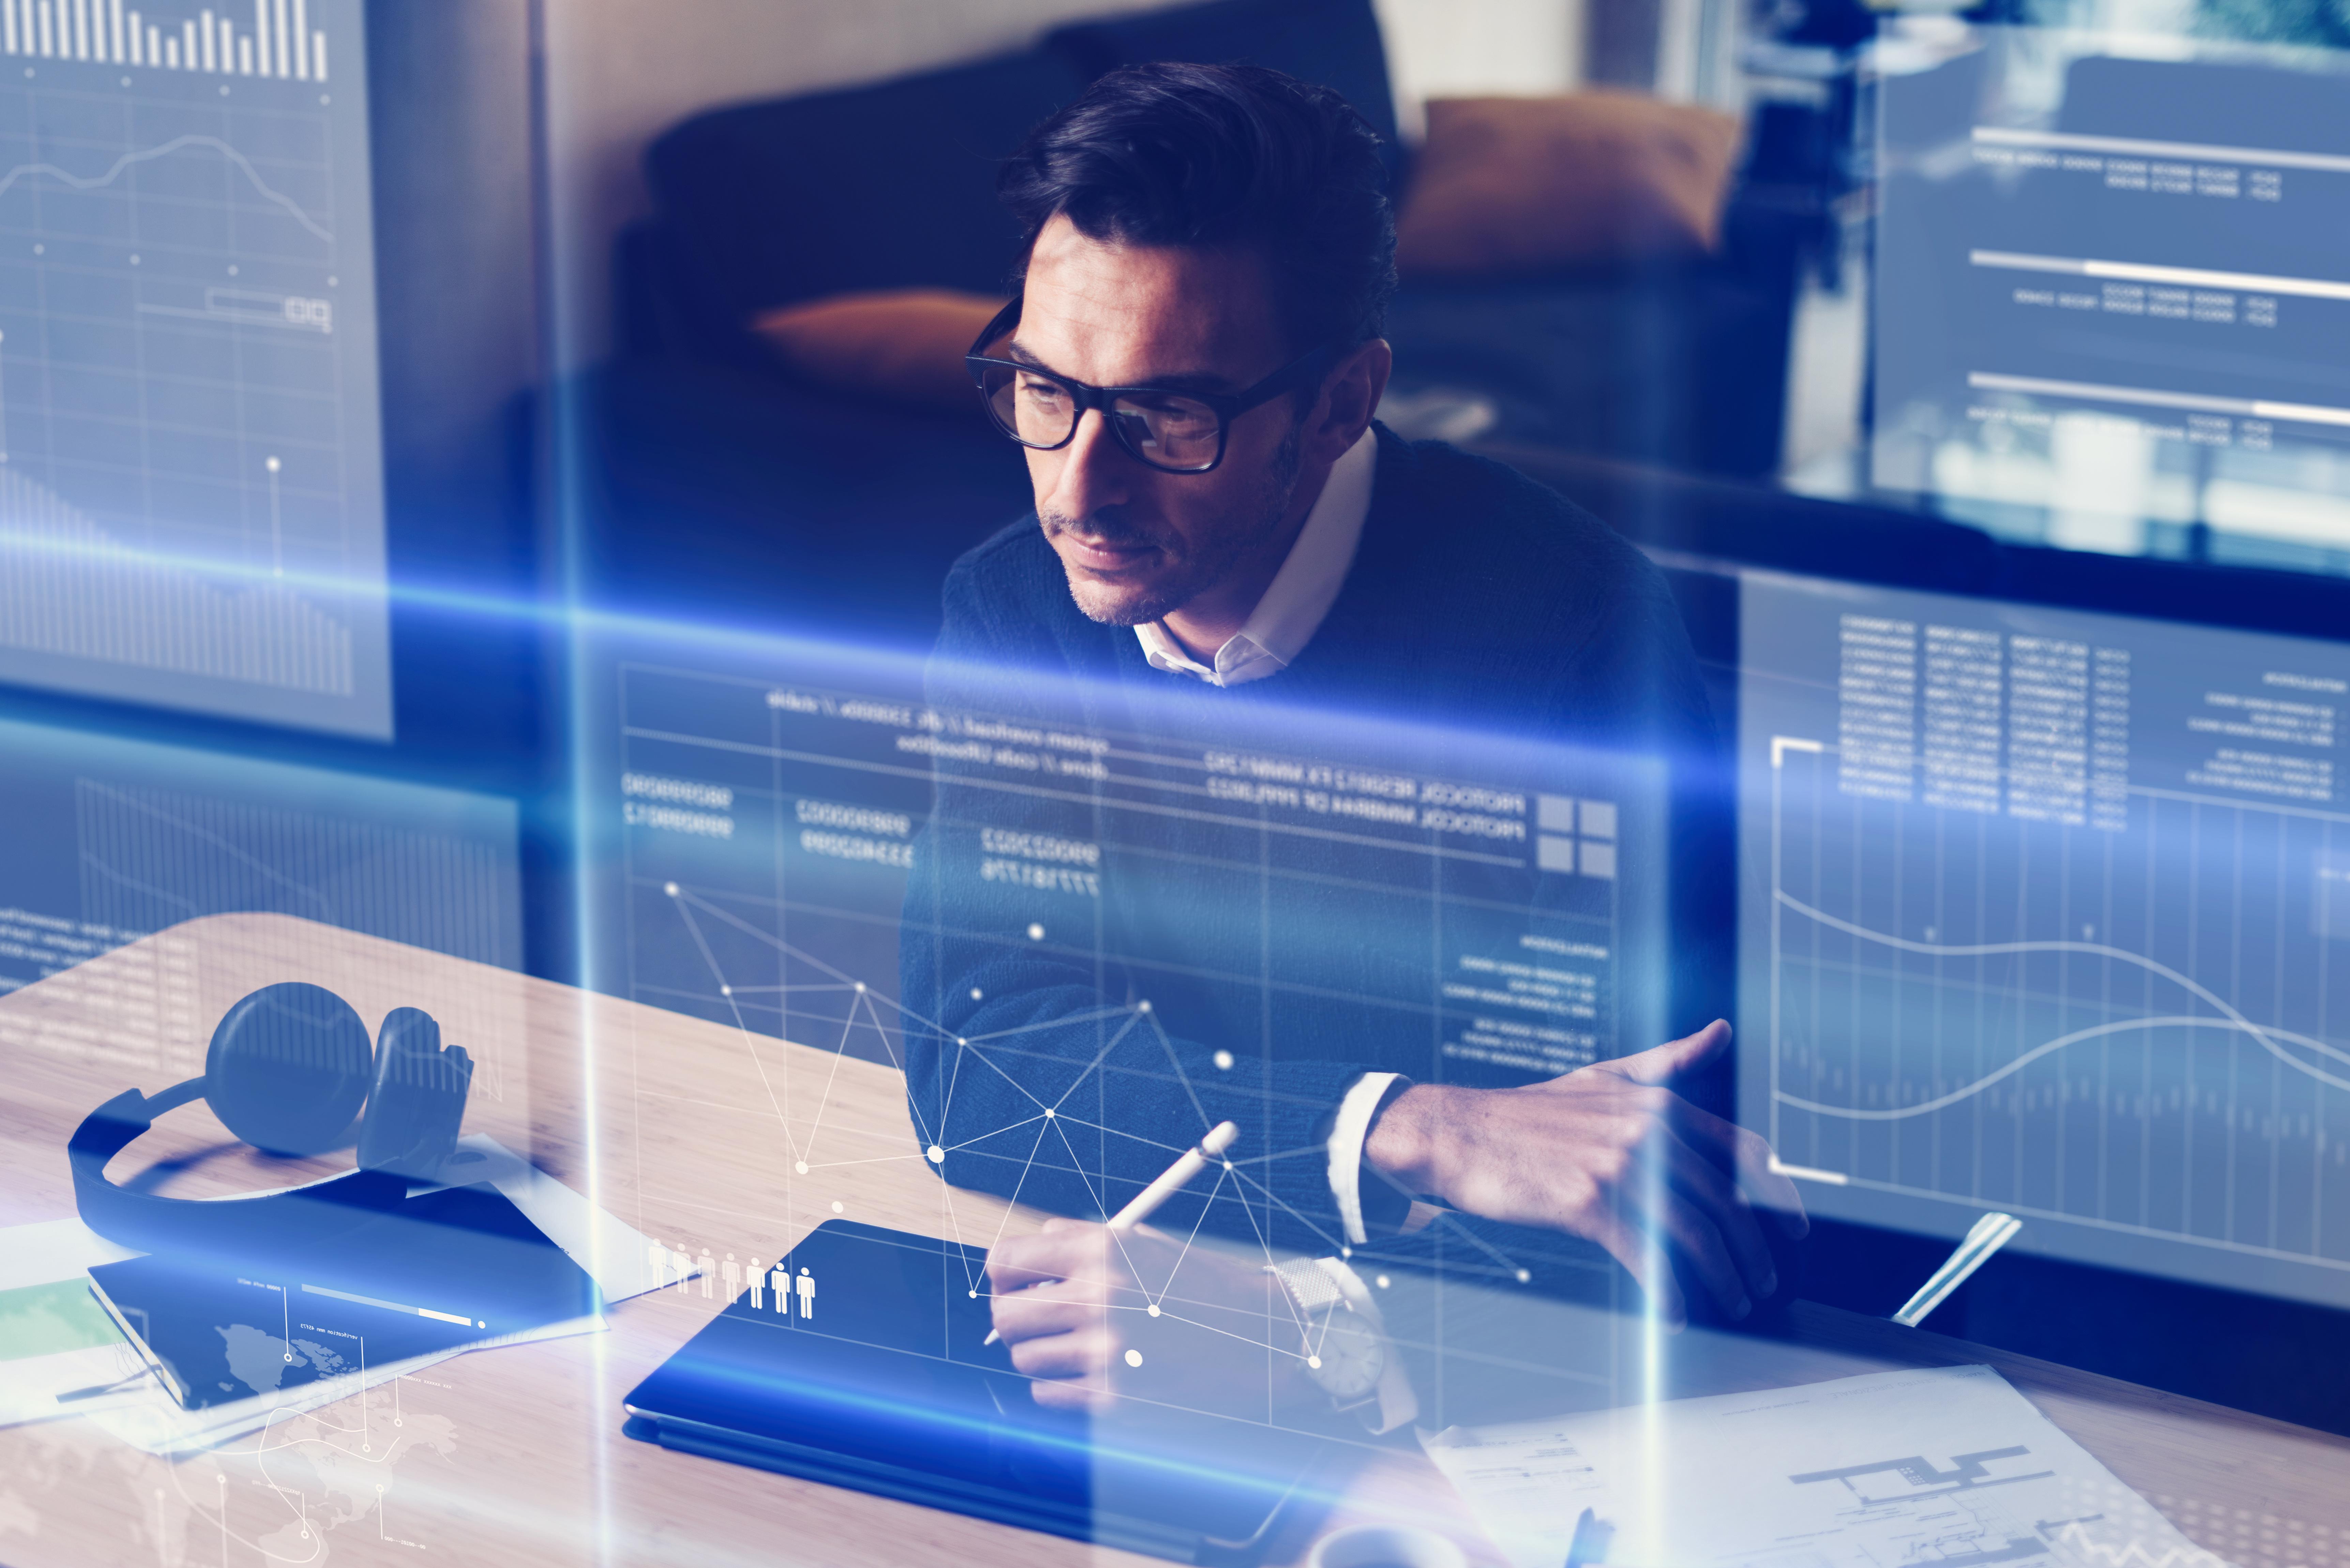 Man working with futuristic interface